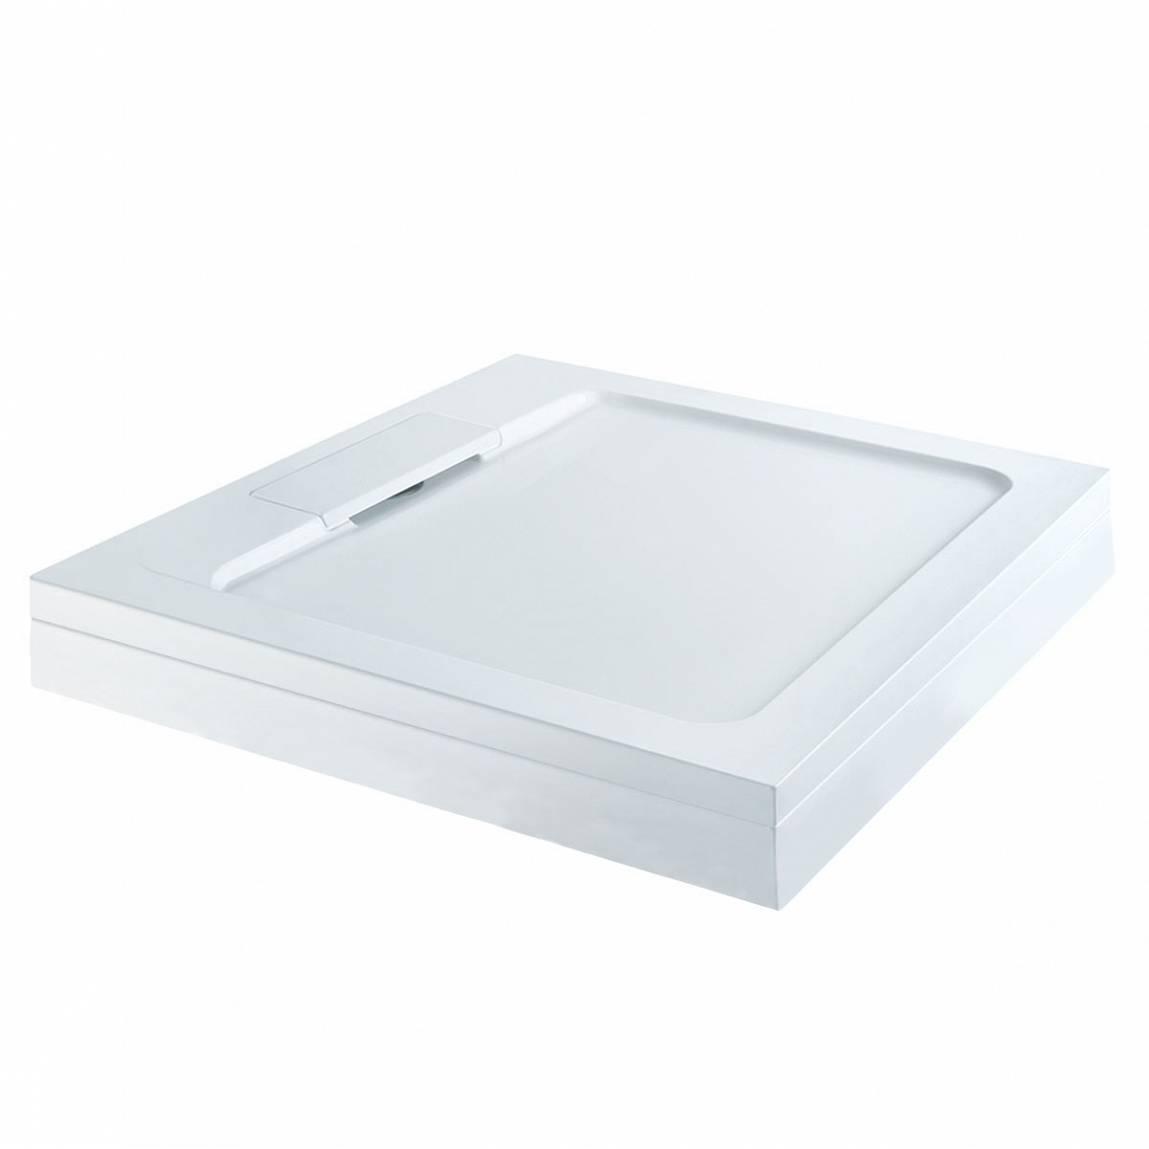 Image of Designer Square Stone Shower Tray & Riser Kit 800 x 800